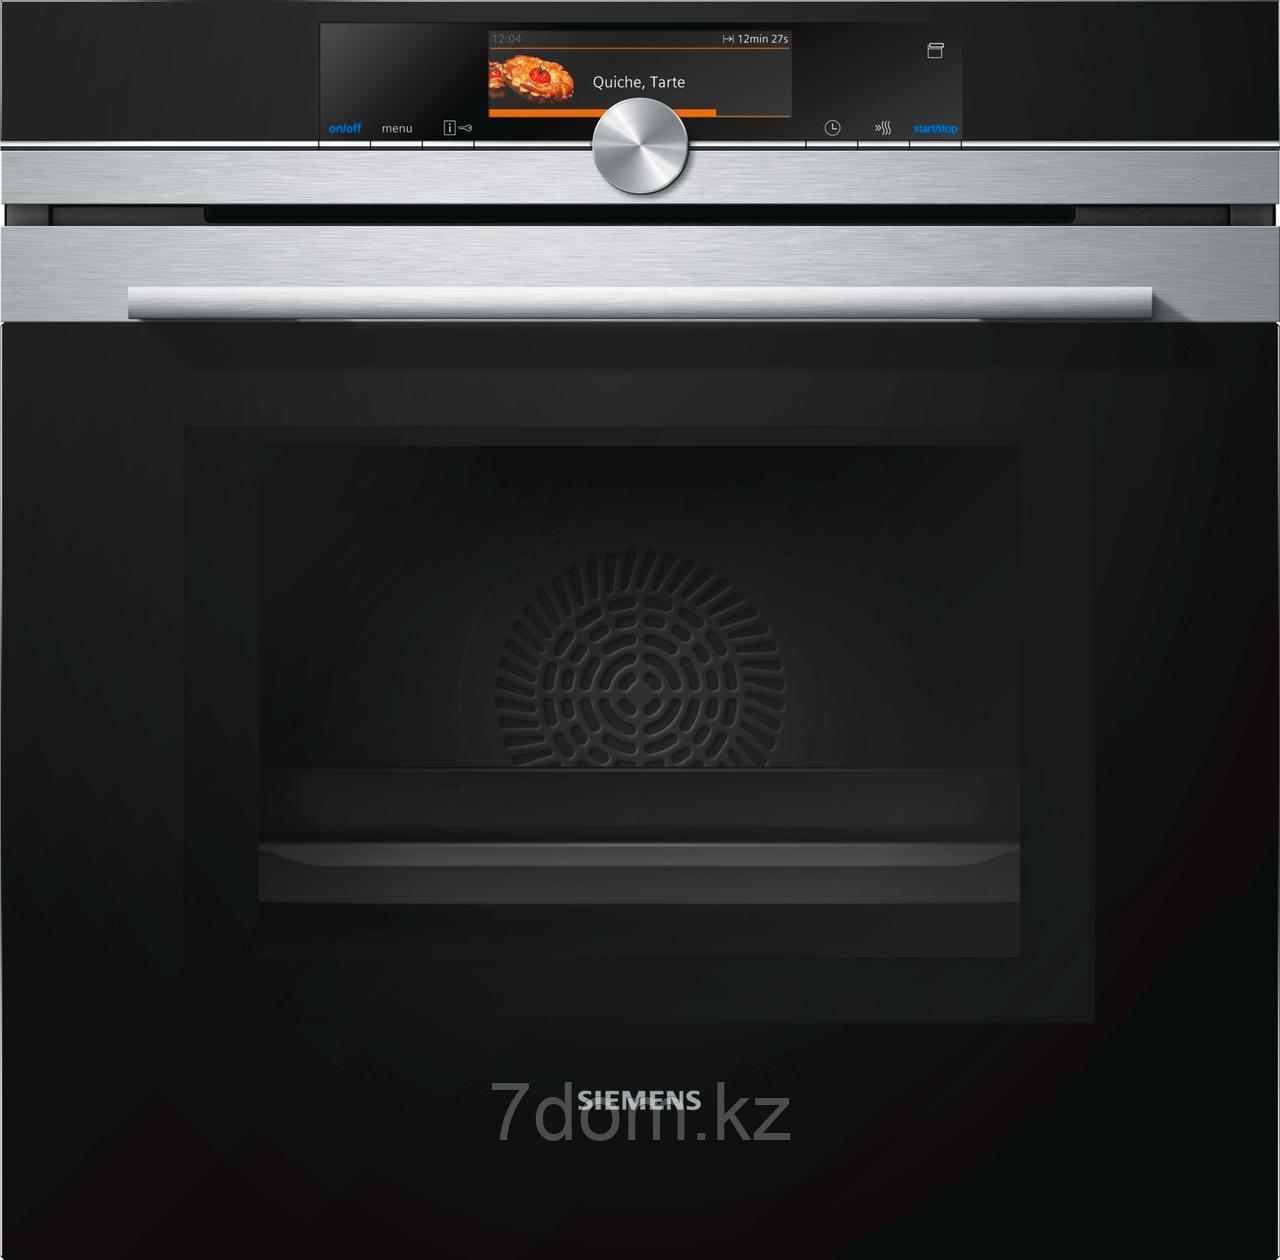 Встраиваемая духовка электр. Siemens HN 678 G4S6